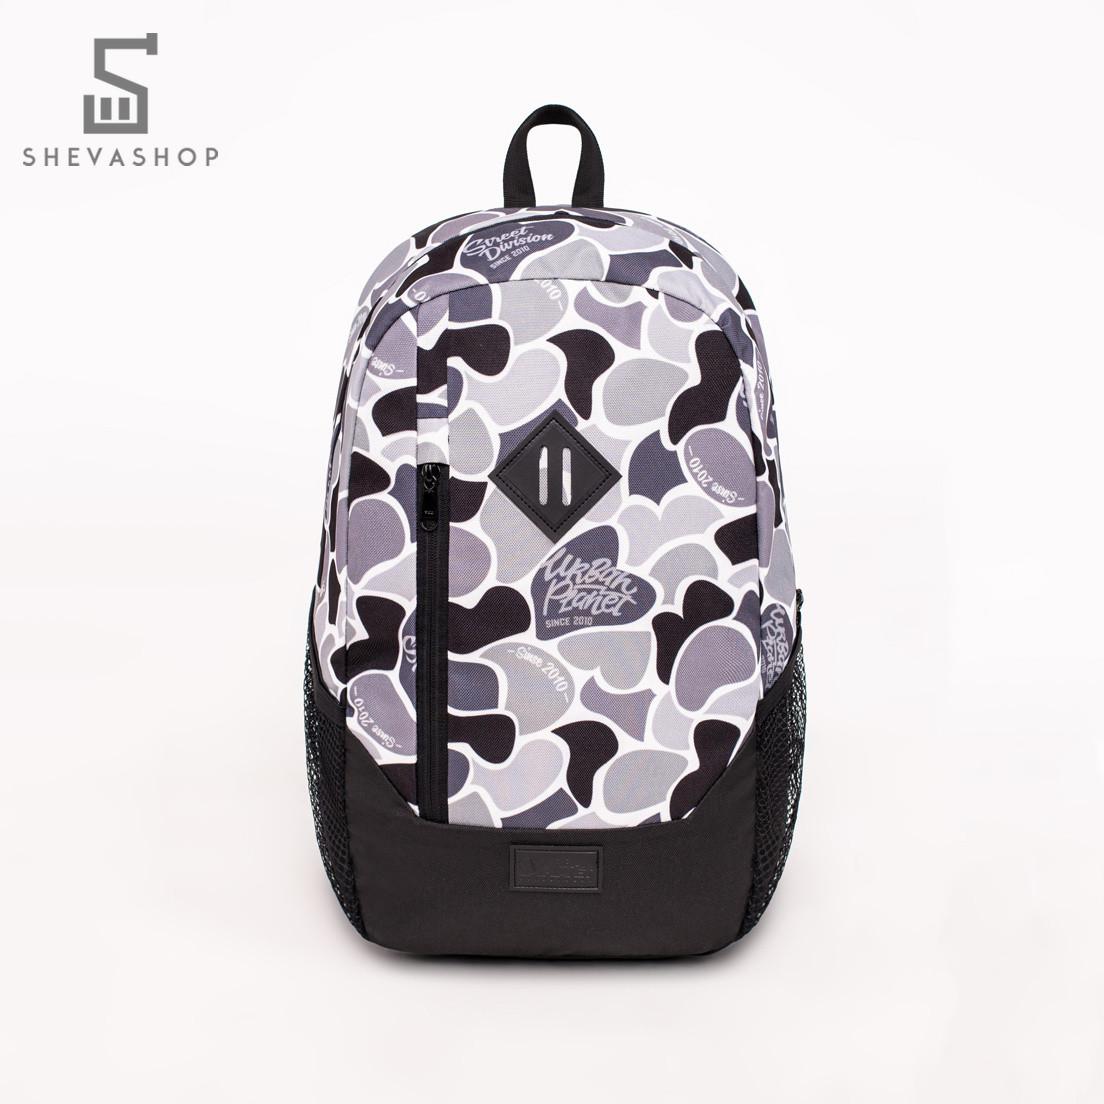 Рюкзак UP B9 DUCK CAMO BW серый камуфляж